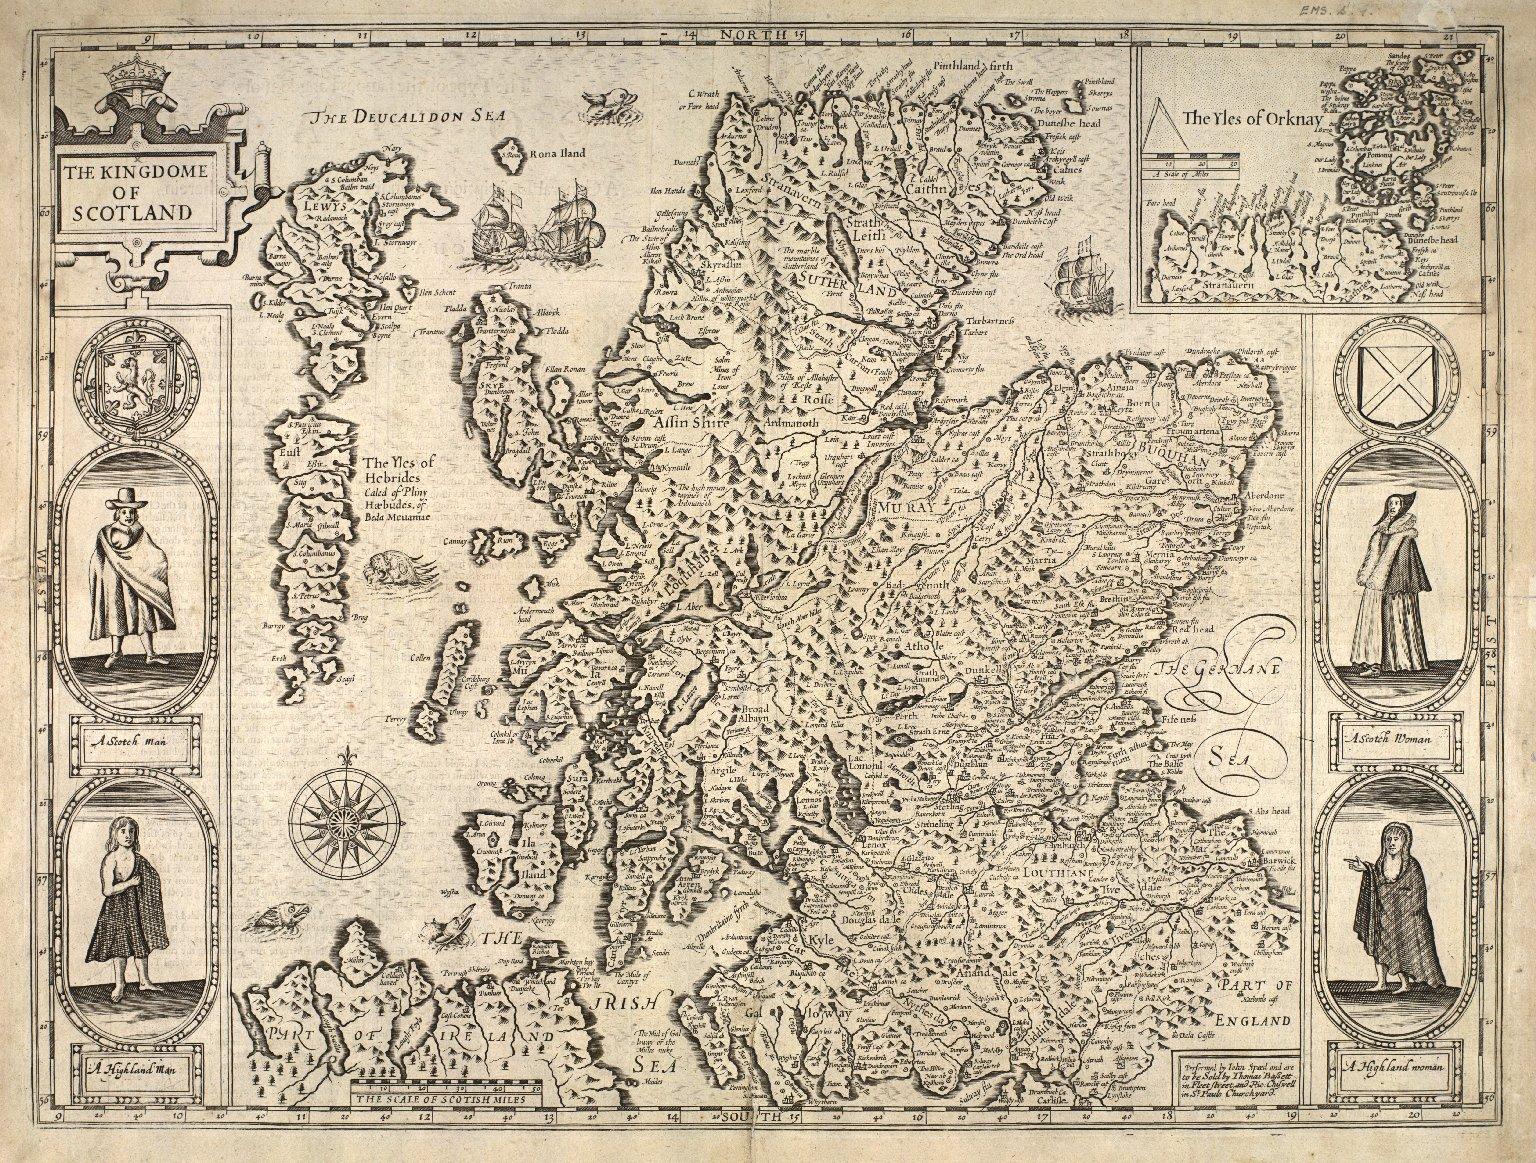 The Kingdome of Scotland [3 of 4]